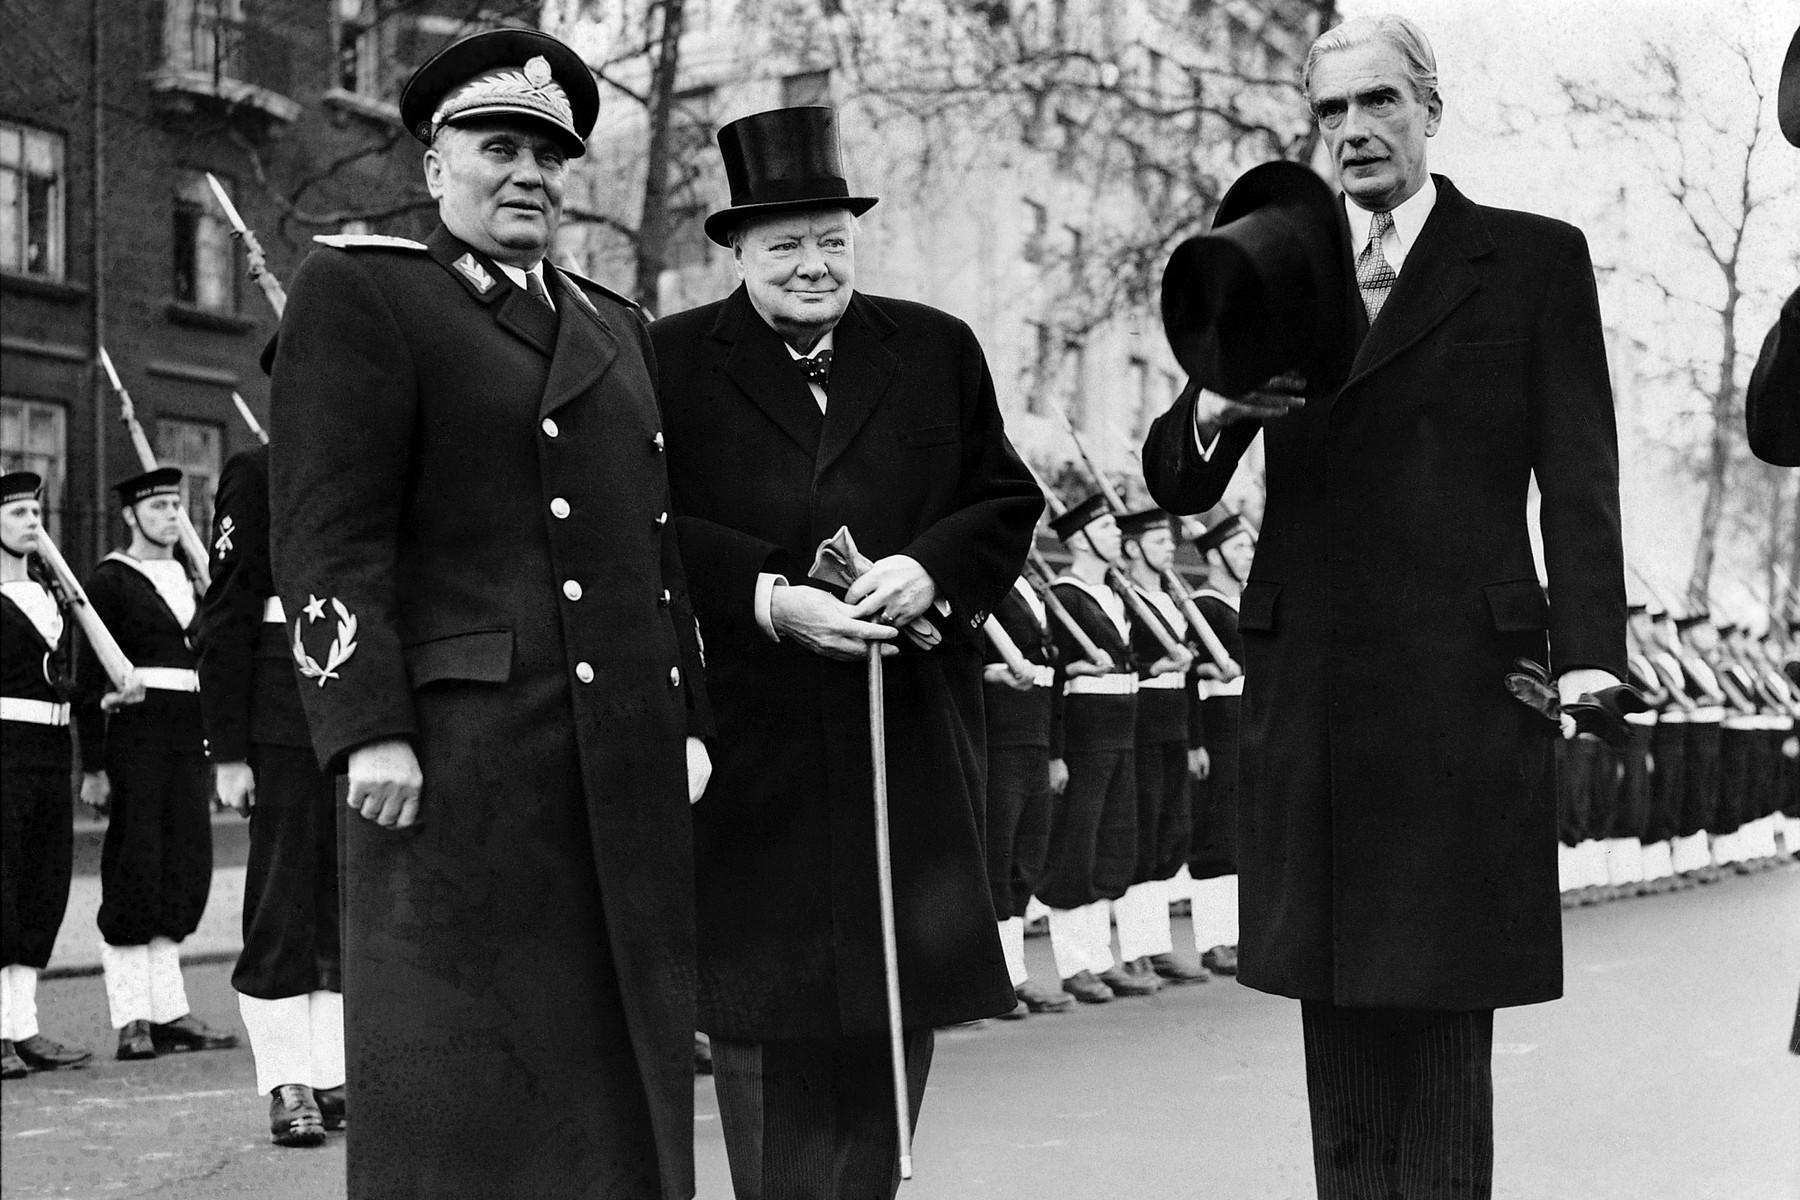 Јосип Броз Тито и Винстон Черчил и Ентони Идн у Лондону, 16. март 1953. (Фото: Keystone-France/Gamma-Rapho via Getty Images)